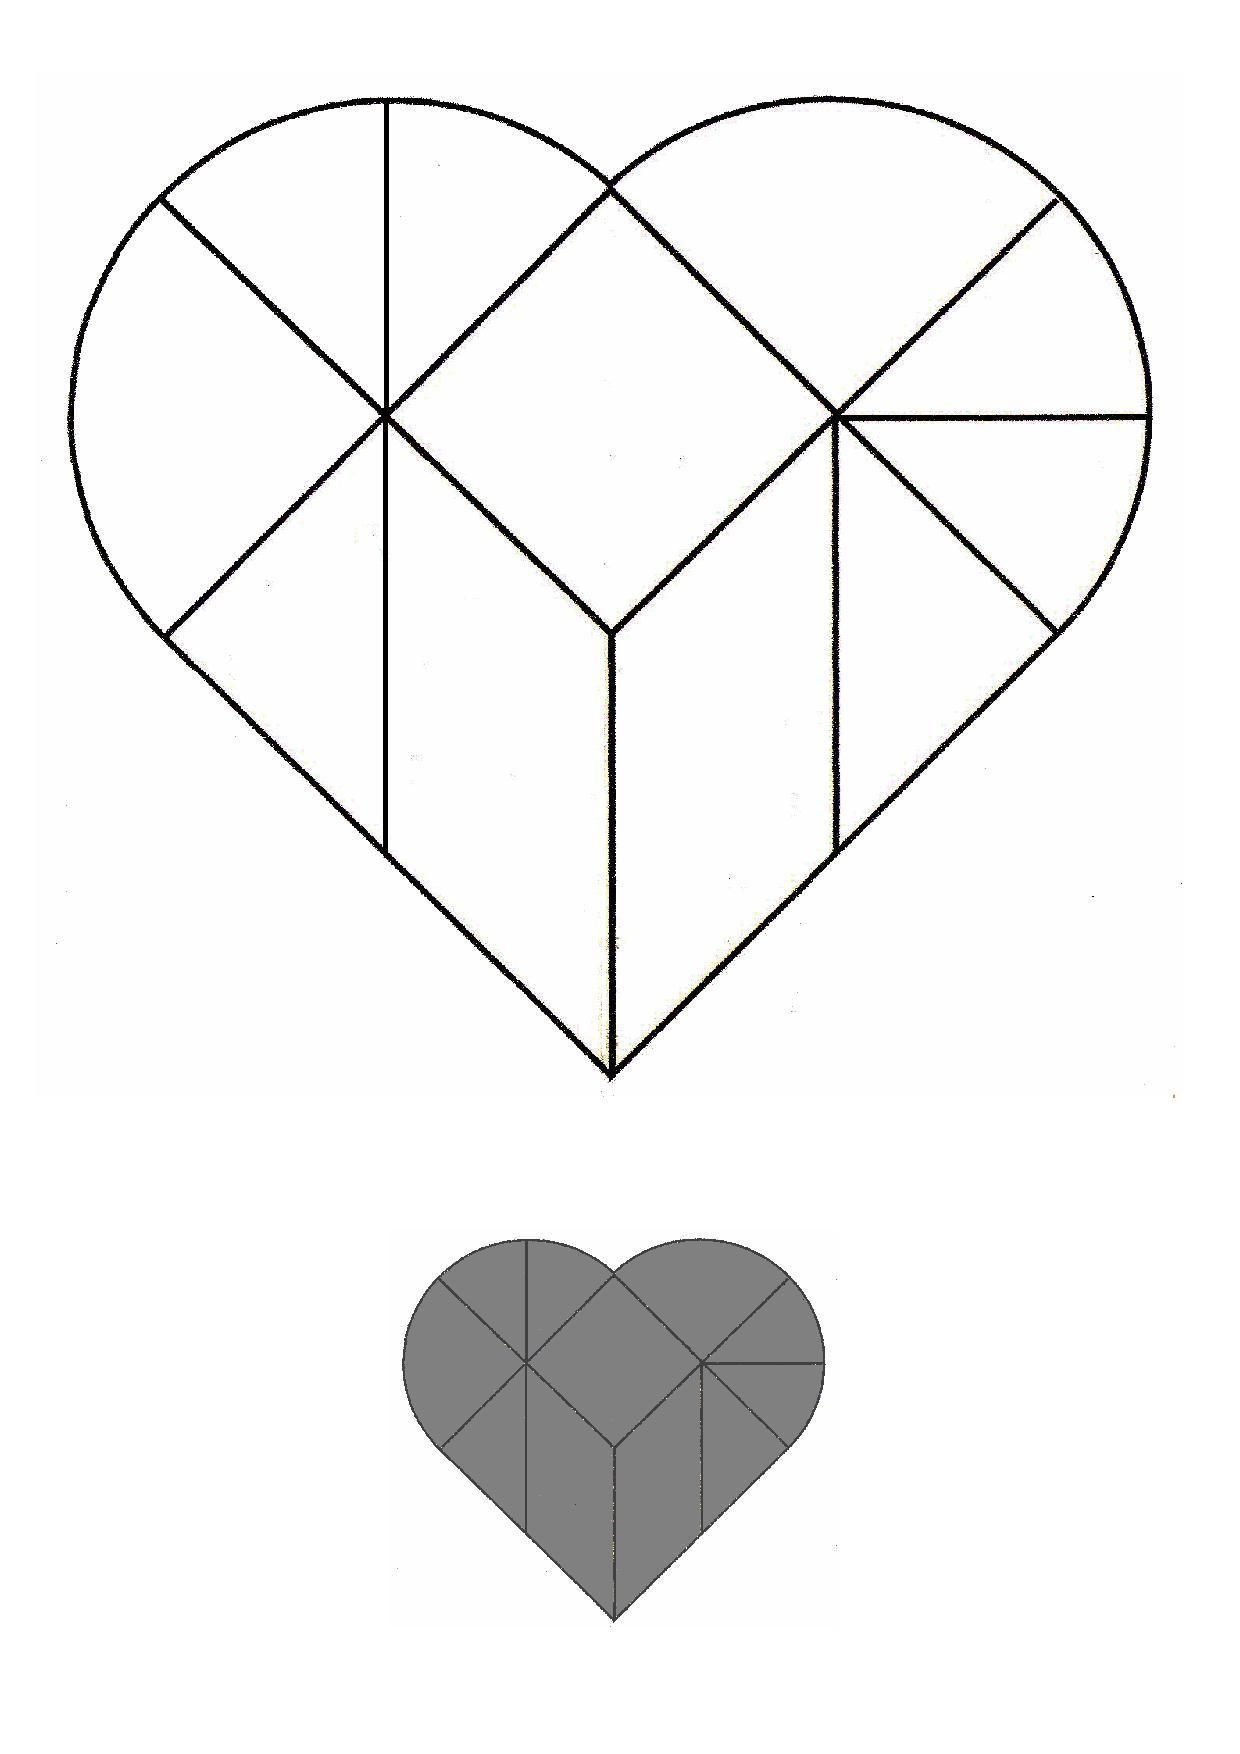 Un Peu Comme A Ecole Tangram tout Tangram A Imprimer